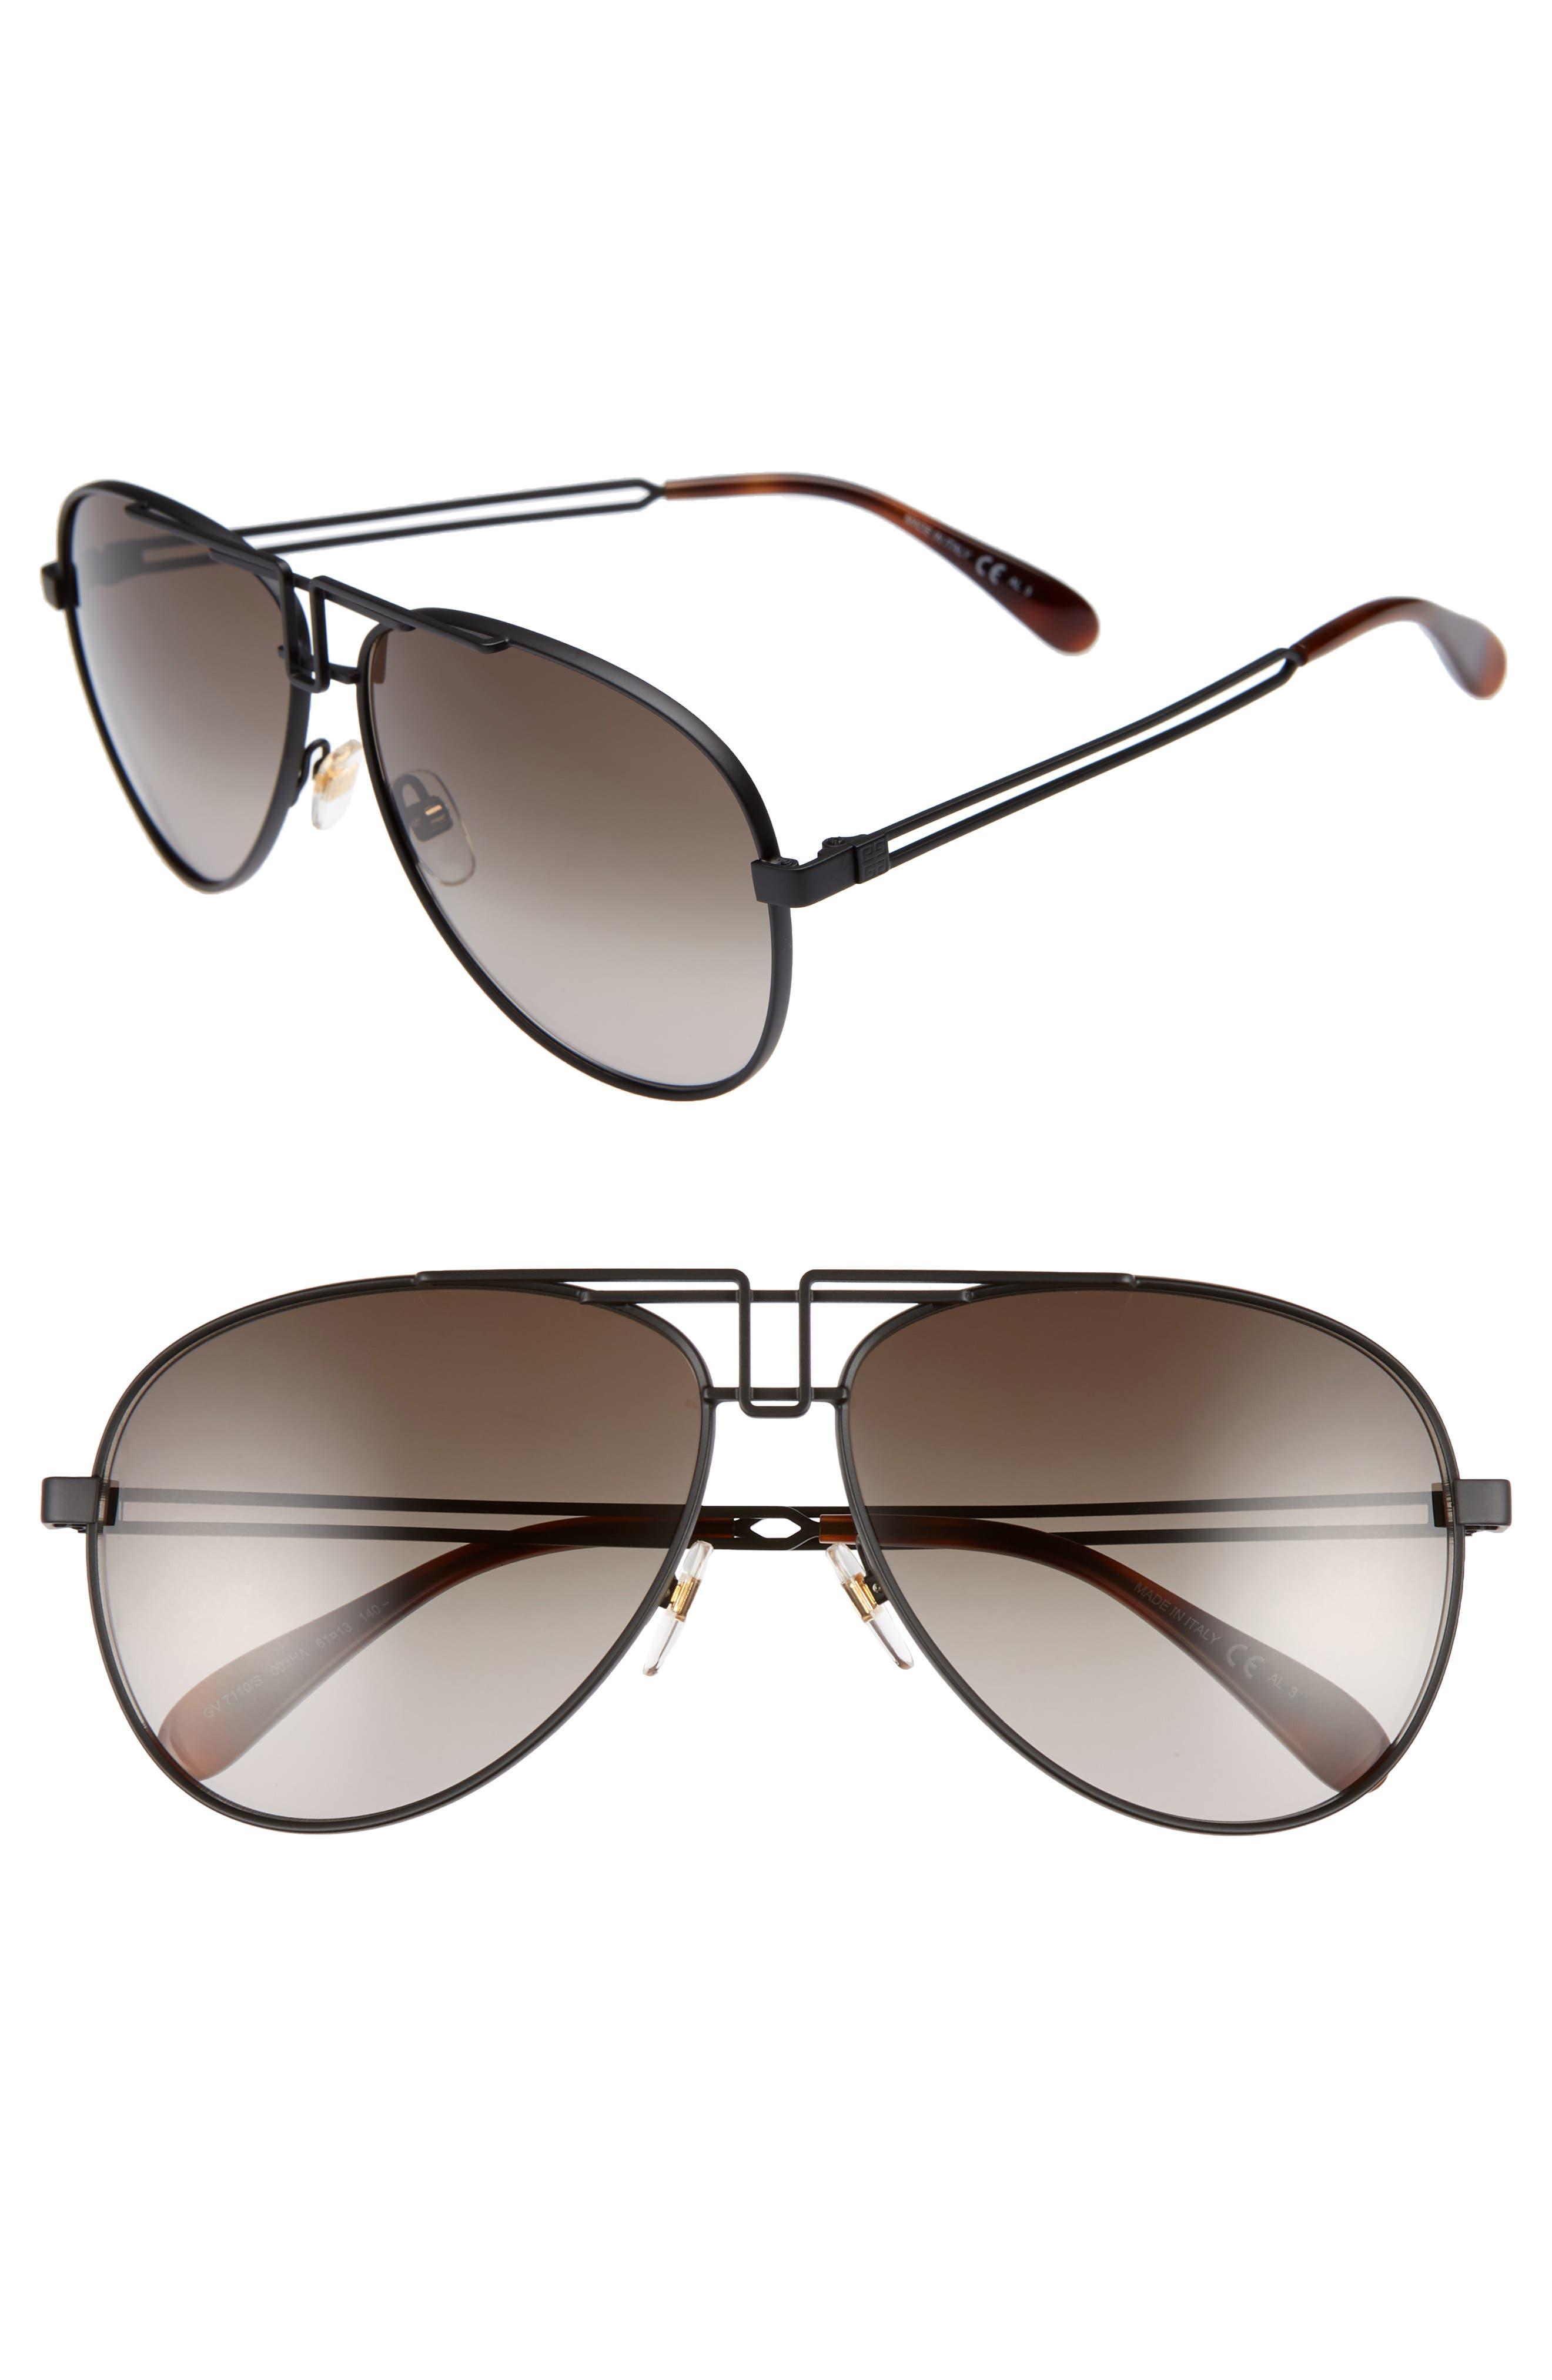 61mm Aviator Sunglasses,                         Main,                         color, MATTE BLACK